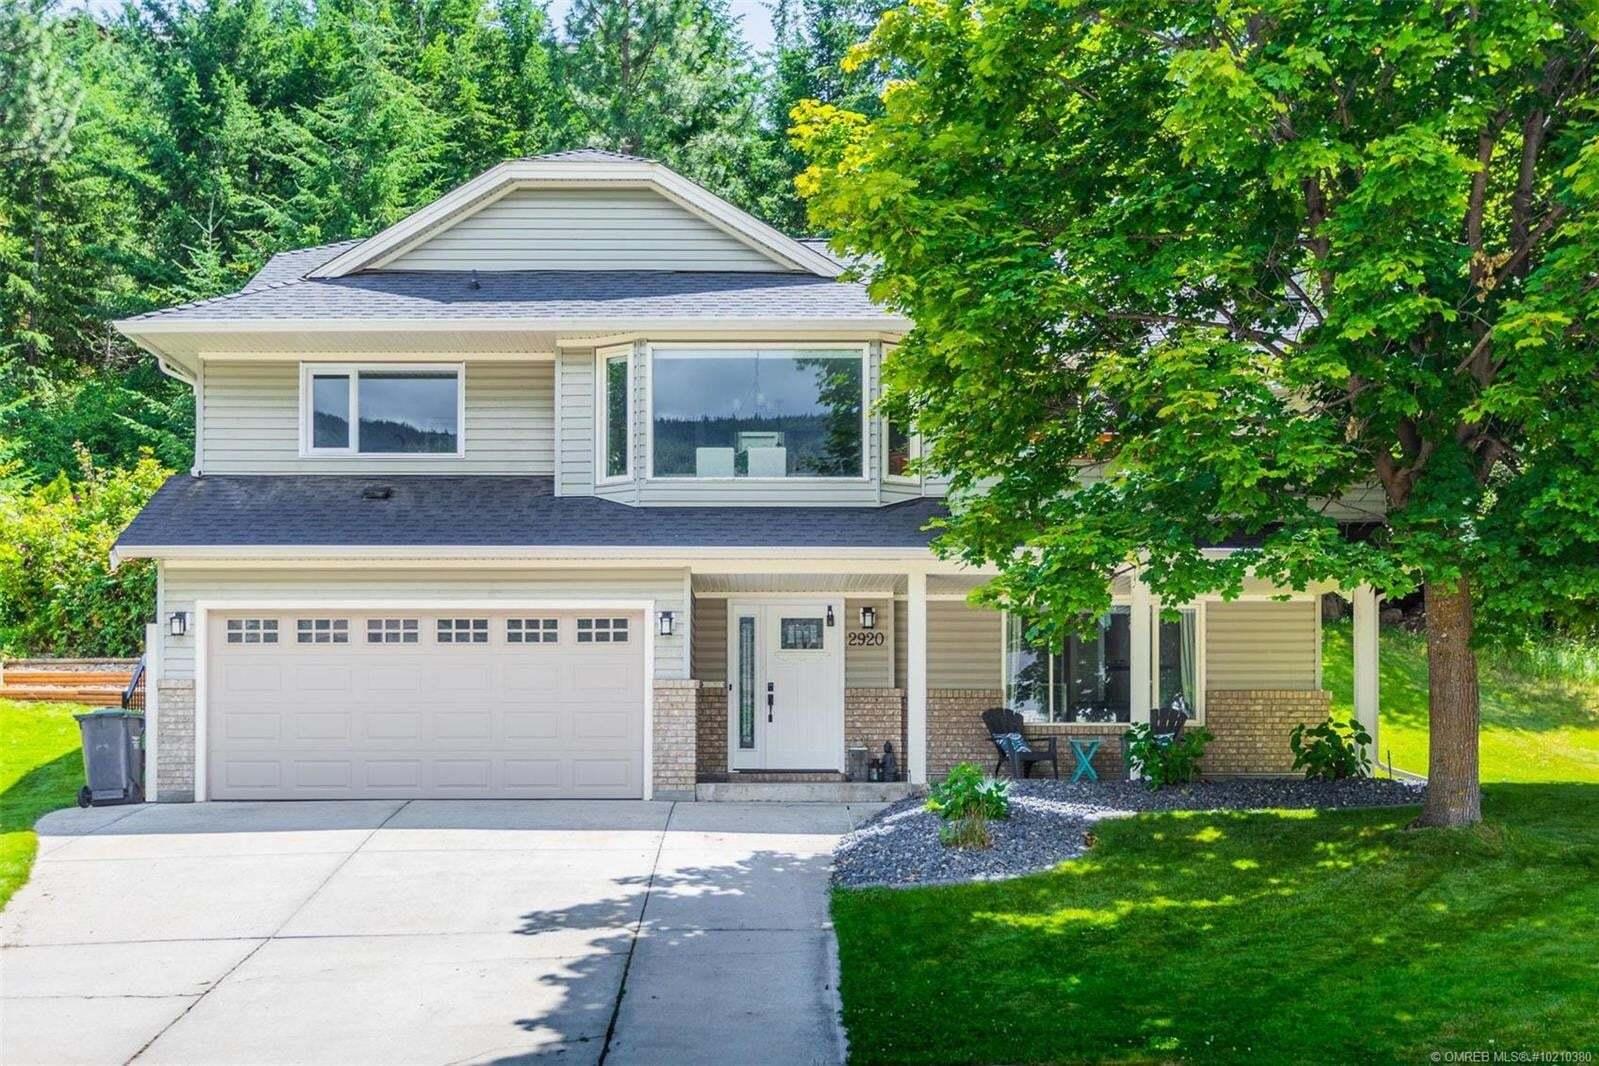 House for sale at 2920 Fieldstone Ct West Kelowna British Columbia - MLS: 10210380